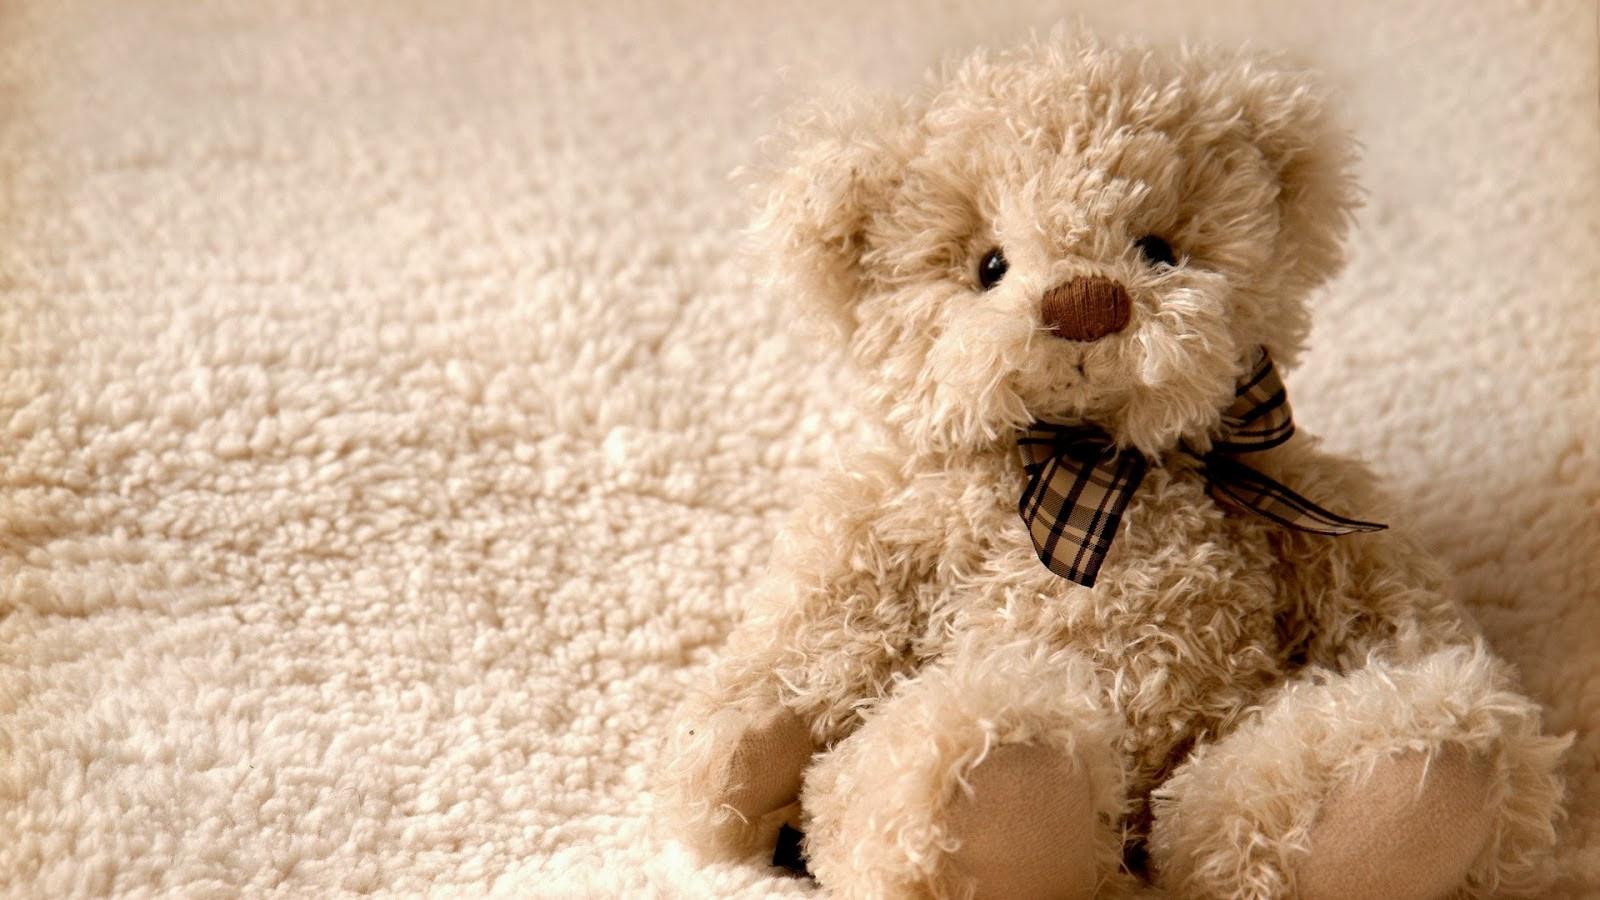 Teddy Bear Wallpaper 1600x900 26612